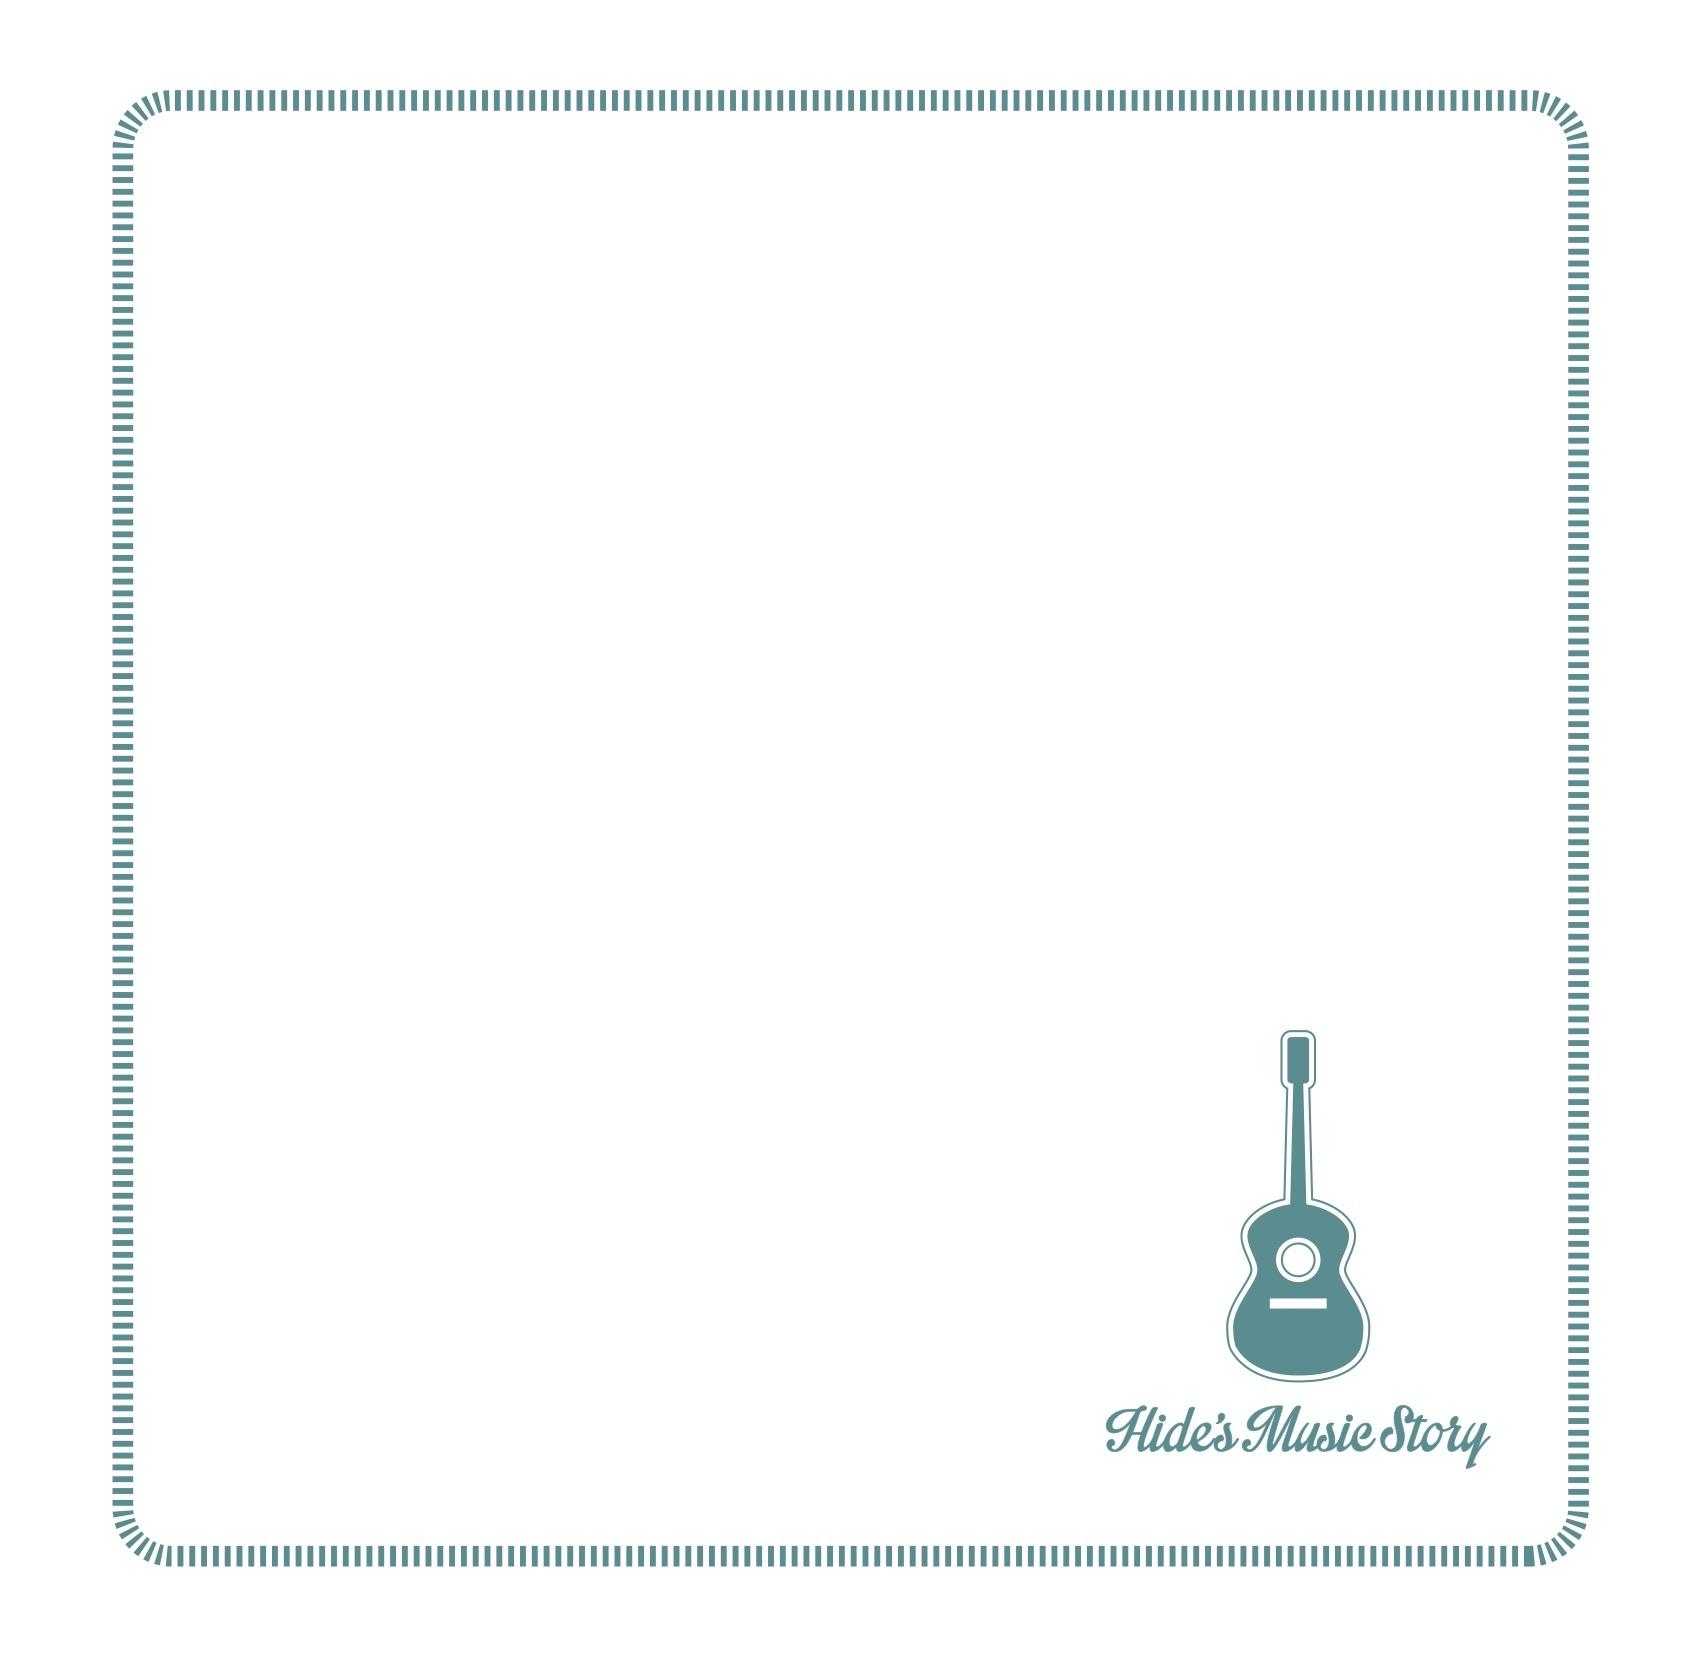 Hide's Music Story ハンドタオル